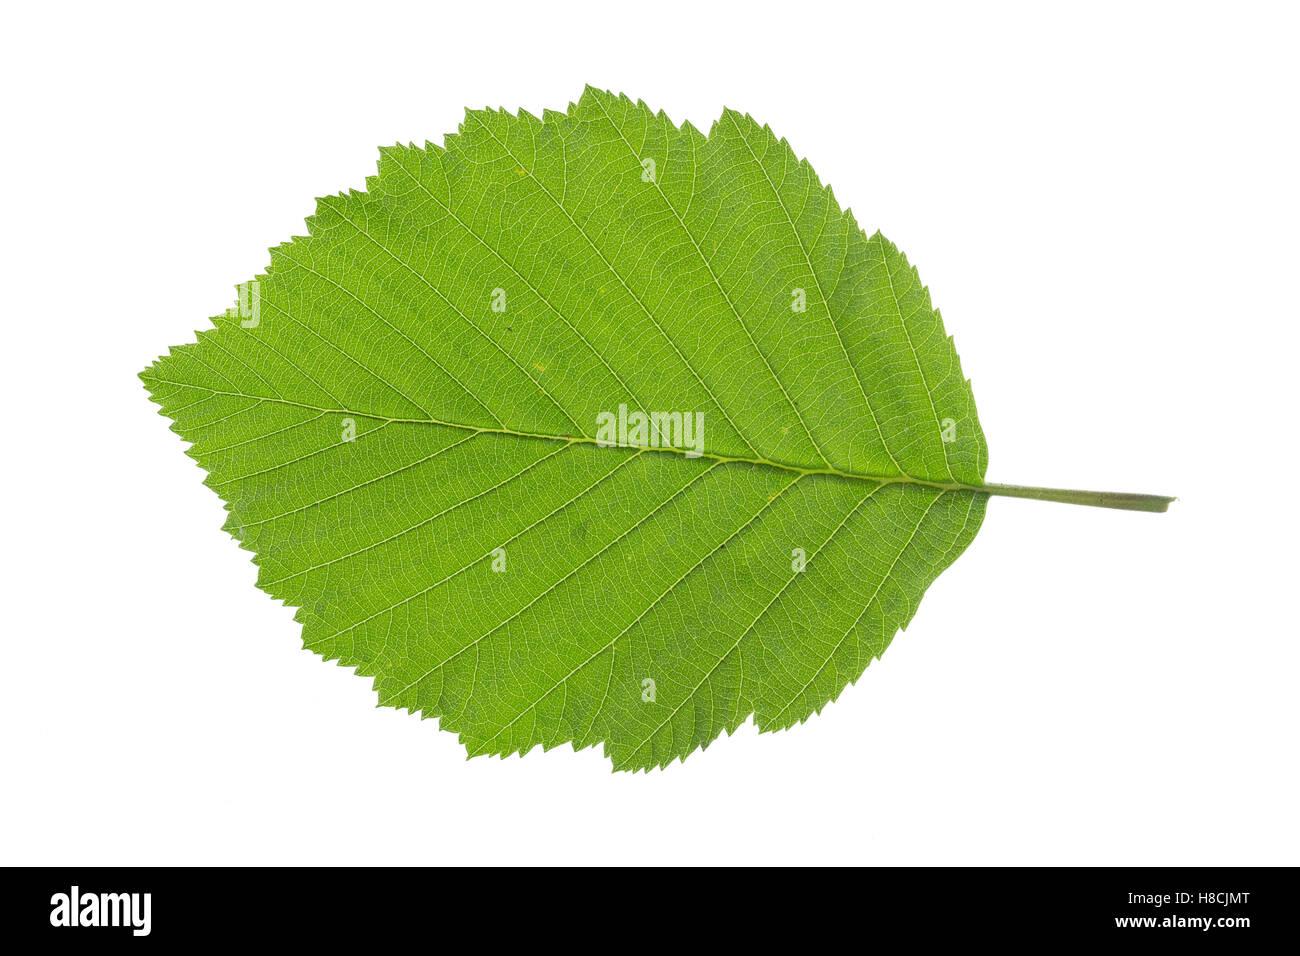 Grau-Erle, Grauerle, Erle, Alnus incana, aliso Gris, Gris Aliso, Aulne blanc. Blatt, Blätter, hojas, hojas Foto de stock